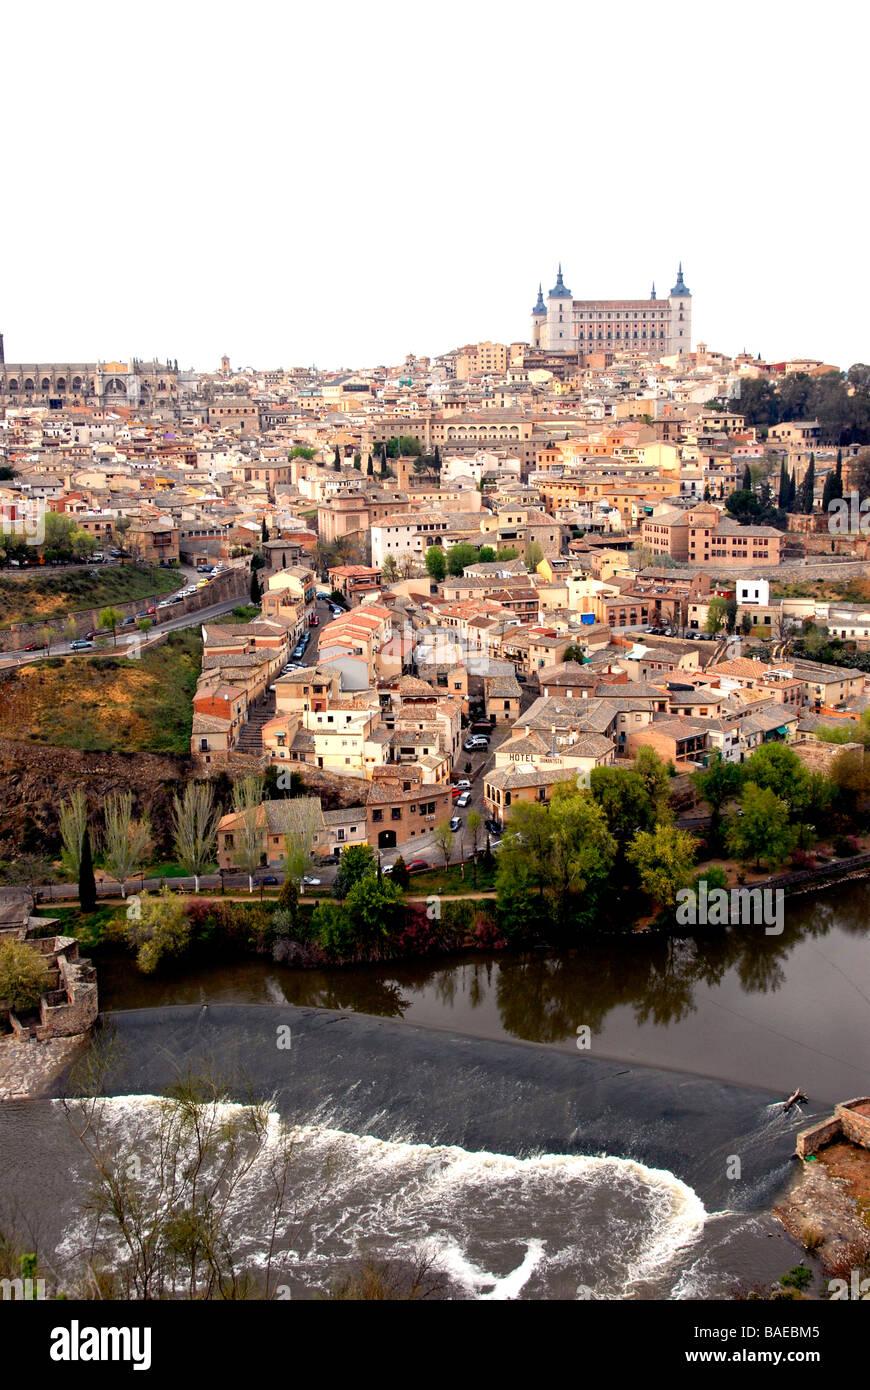 Cityscape, Alcazar and Tage river, Toledo, Spain - Stock Image